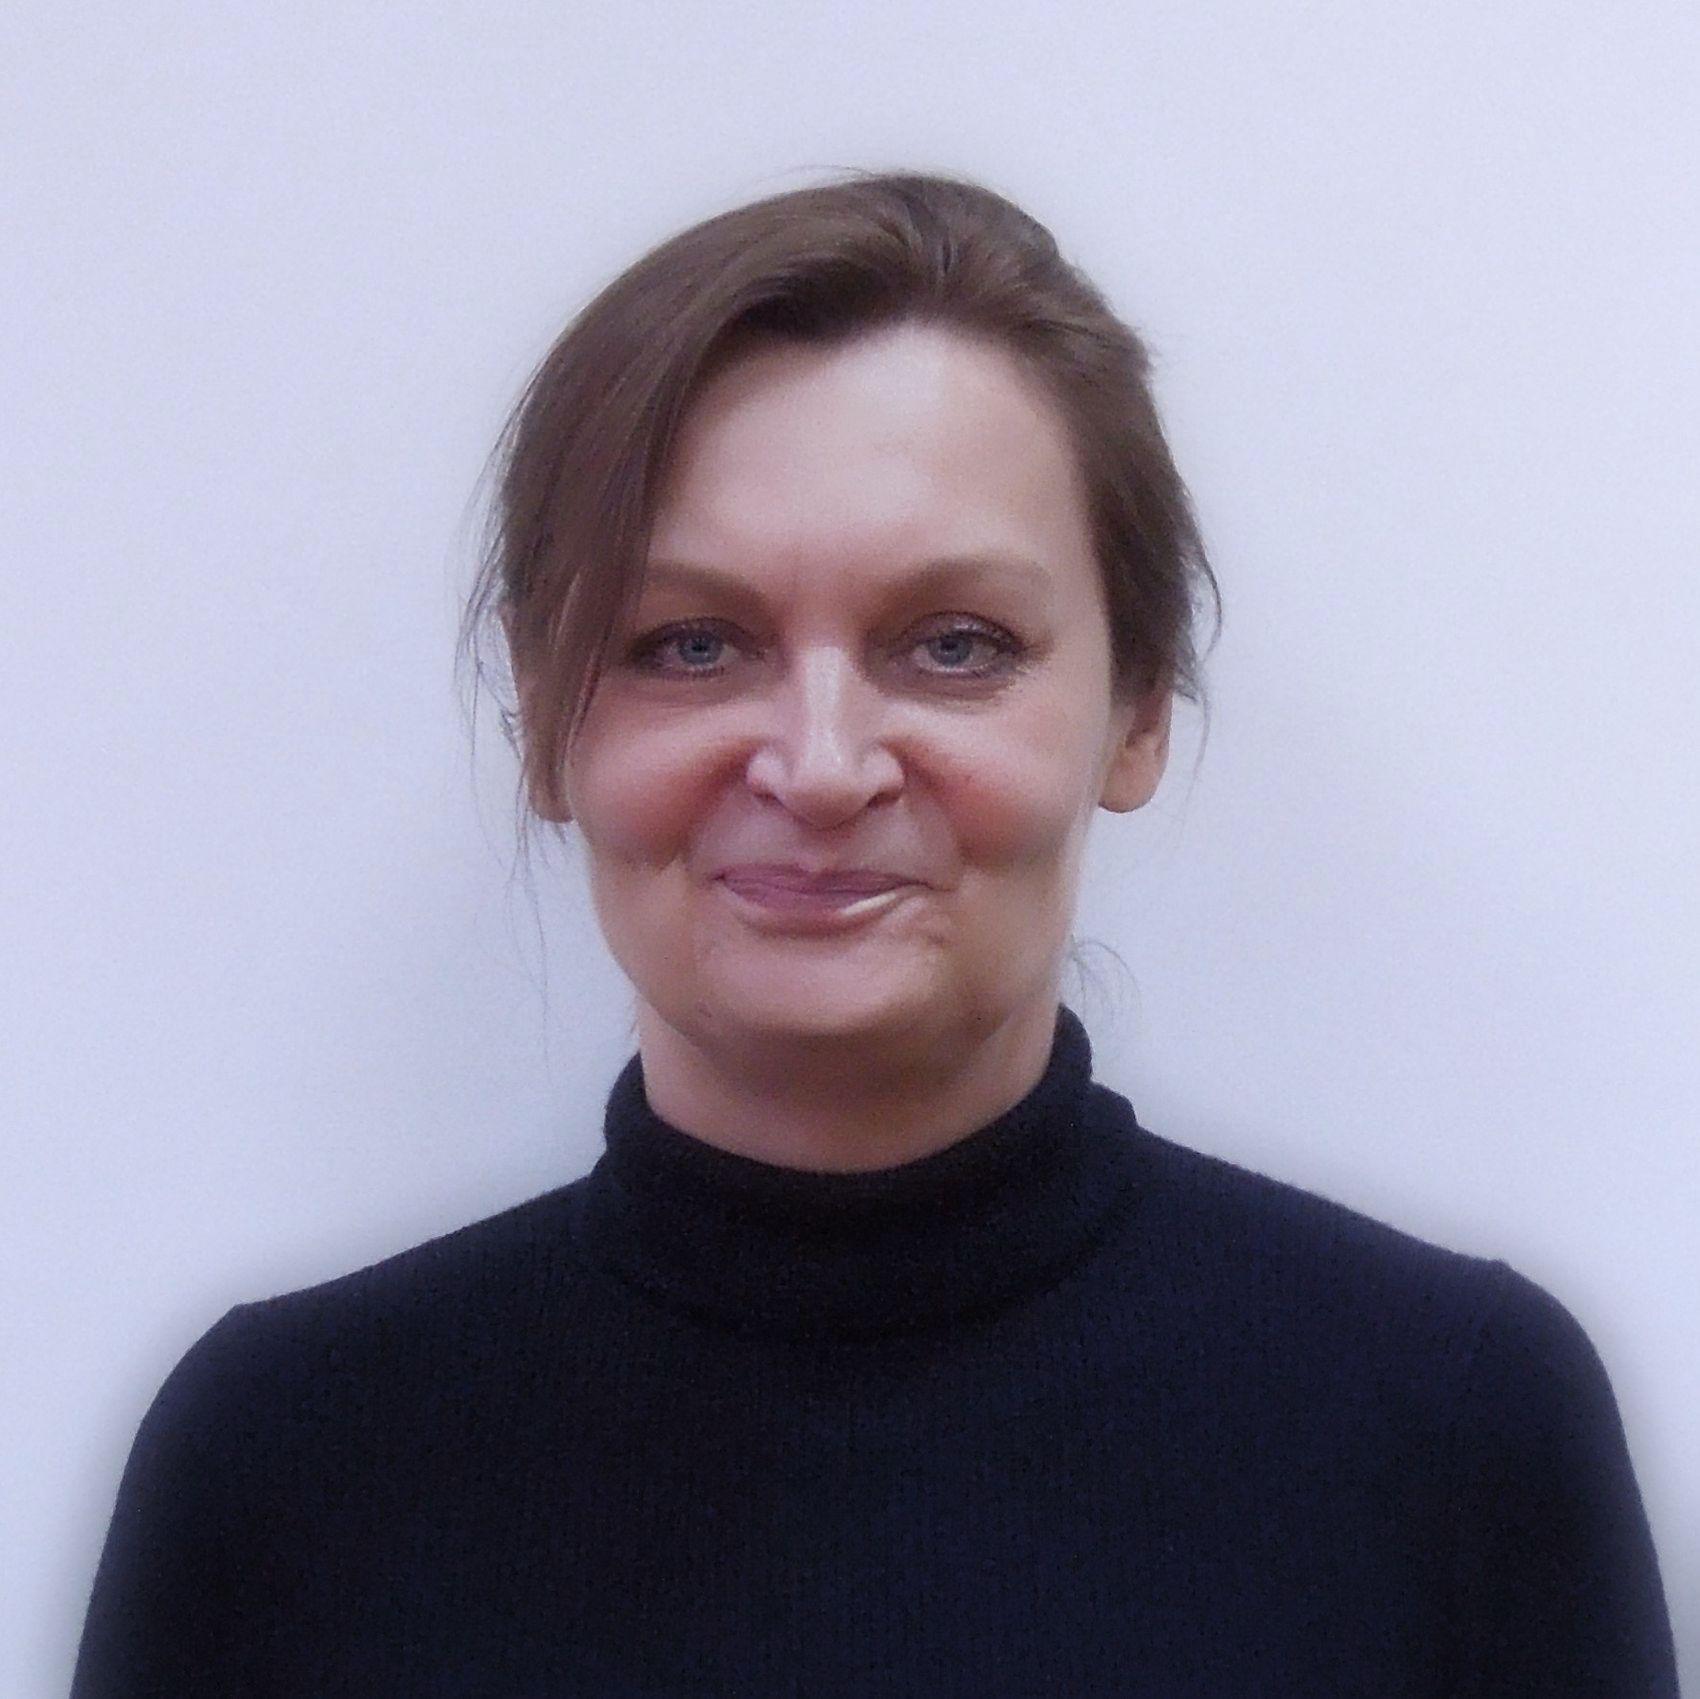 Шерстобитова Жанна Викторовна